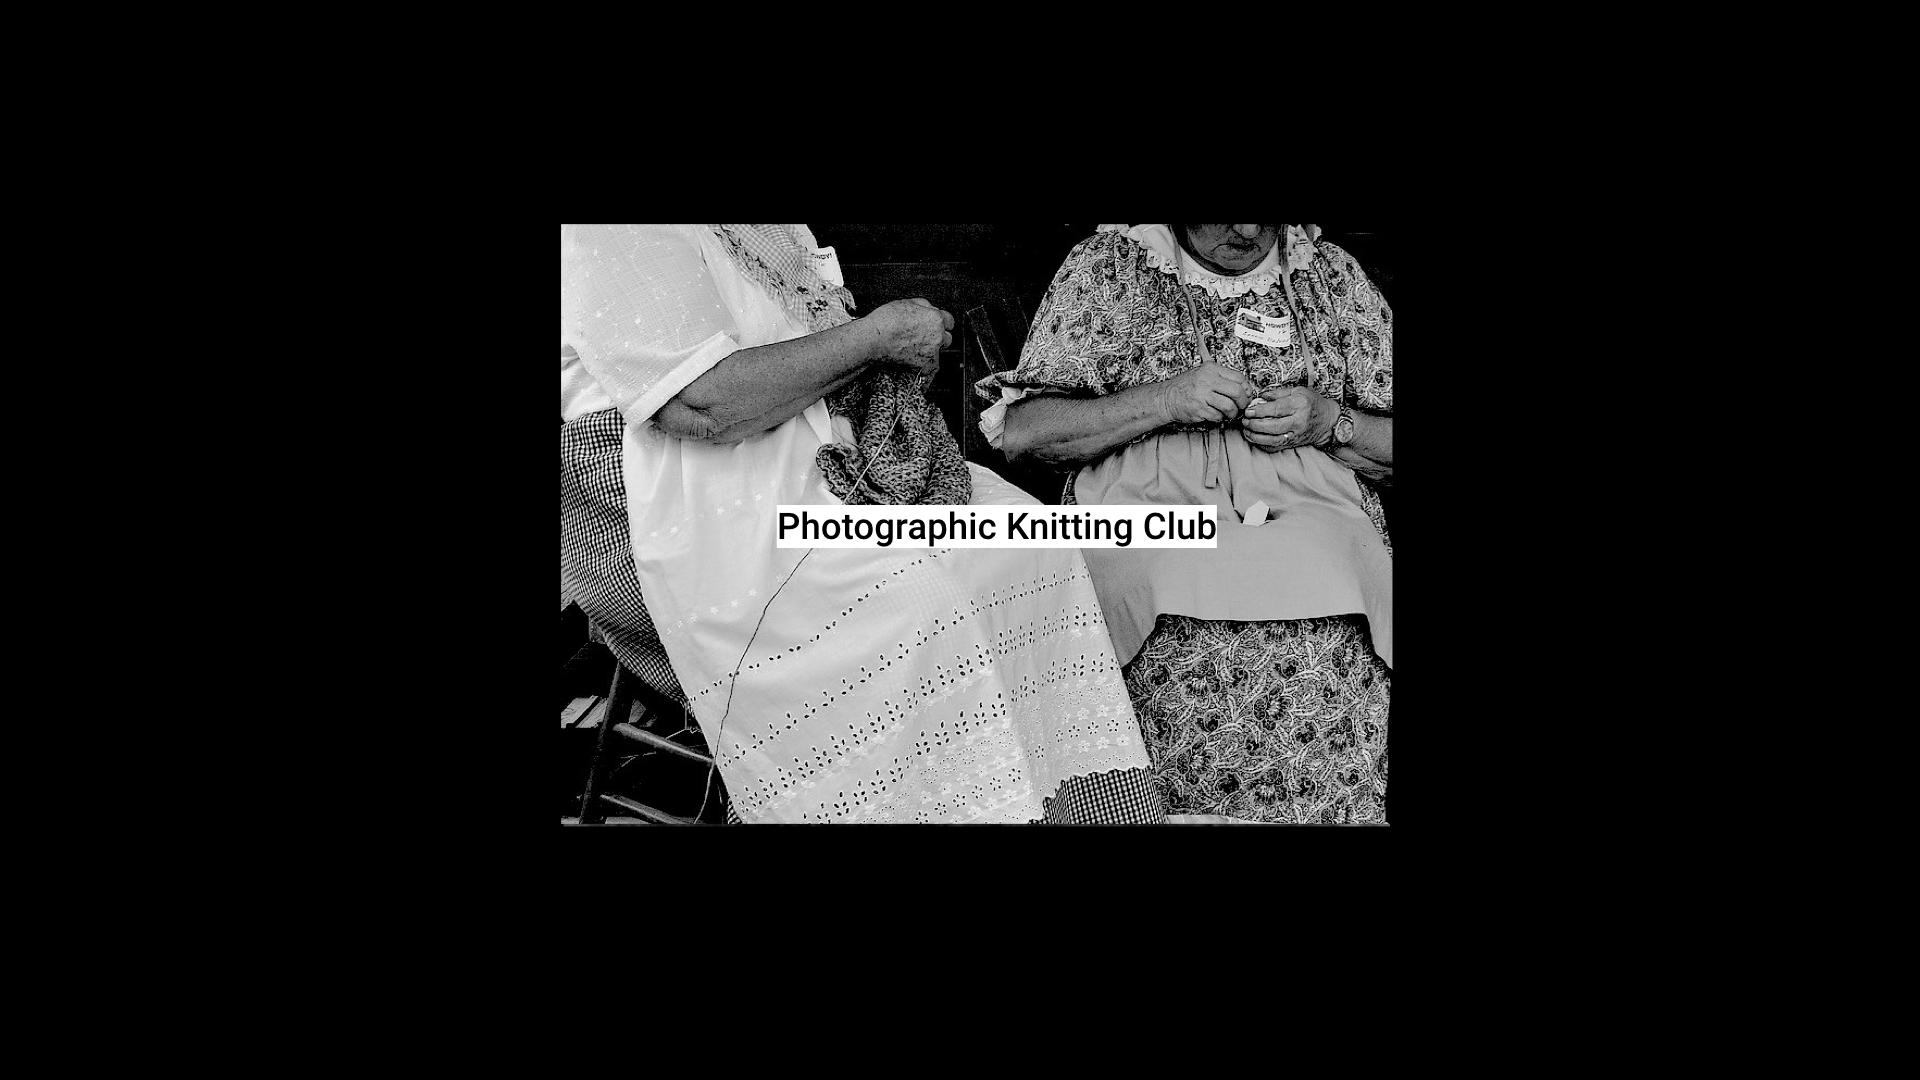 Photographic Knitting Club